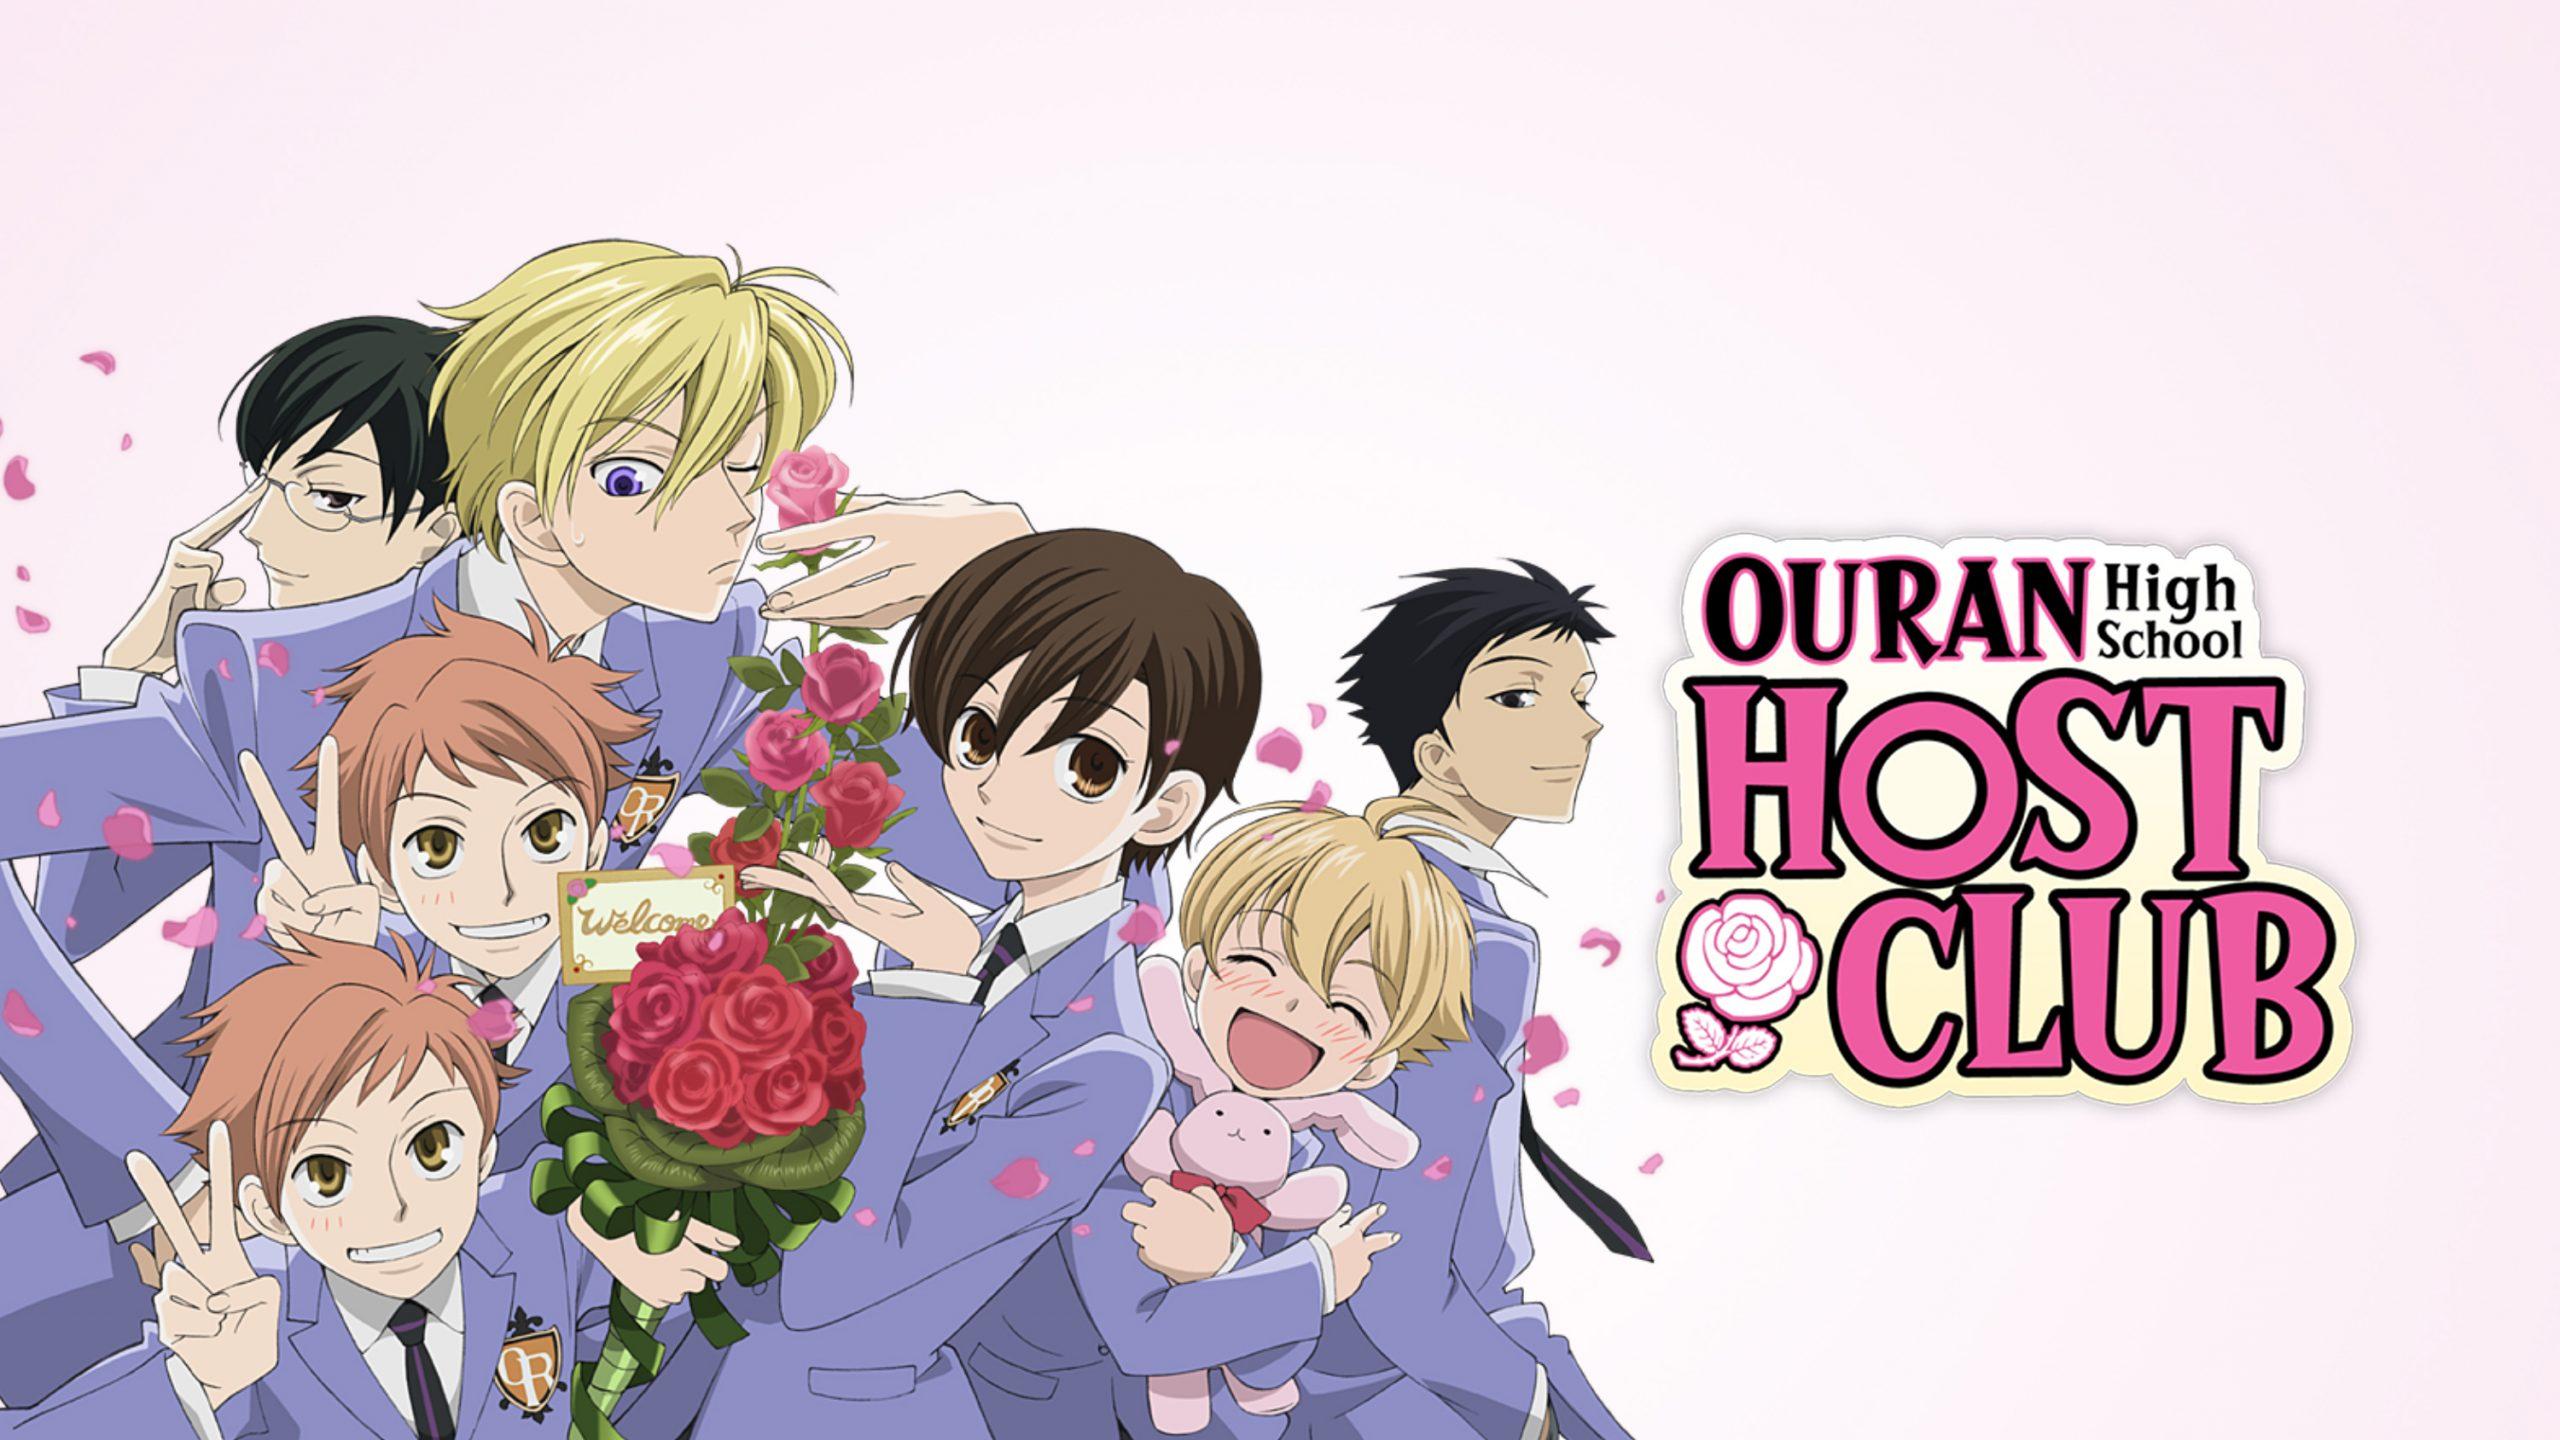 Ouran Highschool Host Club Season 2: Release Date